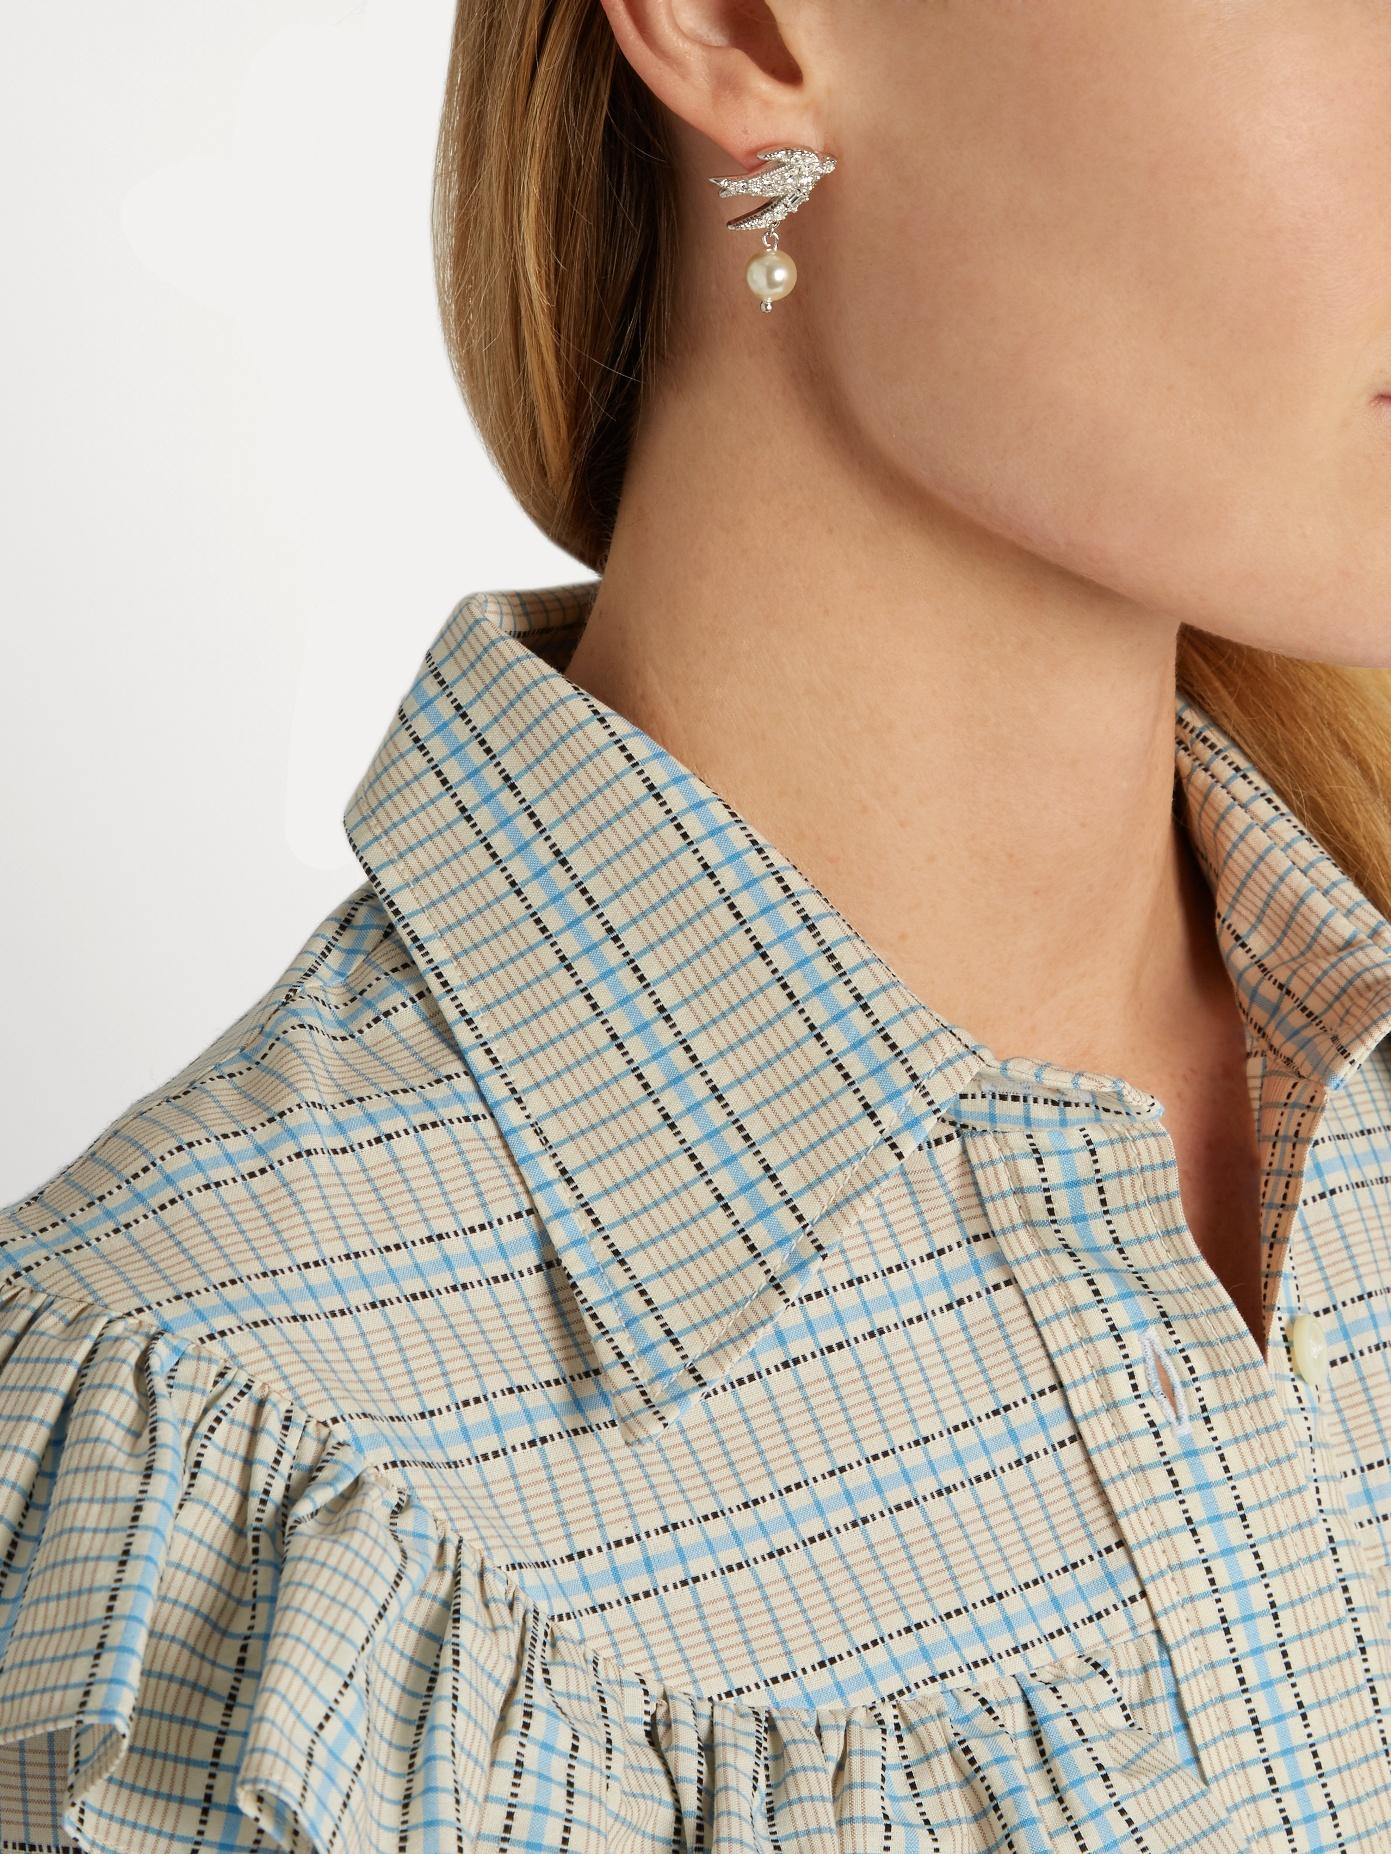 A woman wearing Miu Miu SwallowCrystal Earringsand a plaid shirt with ruffles